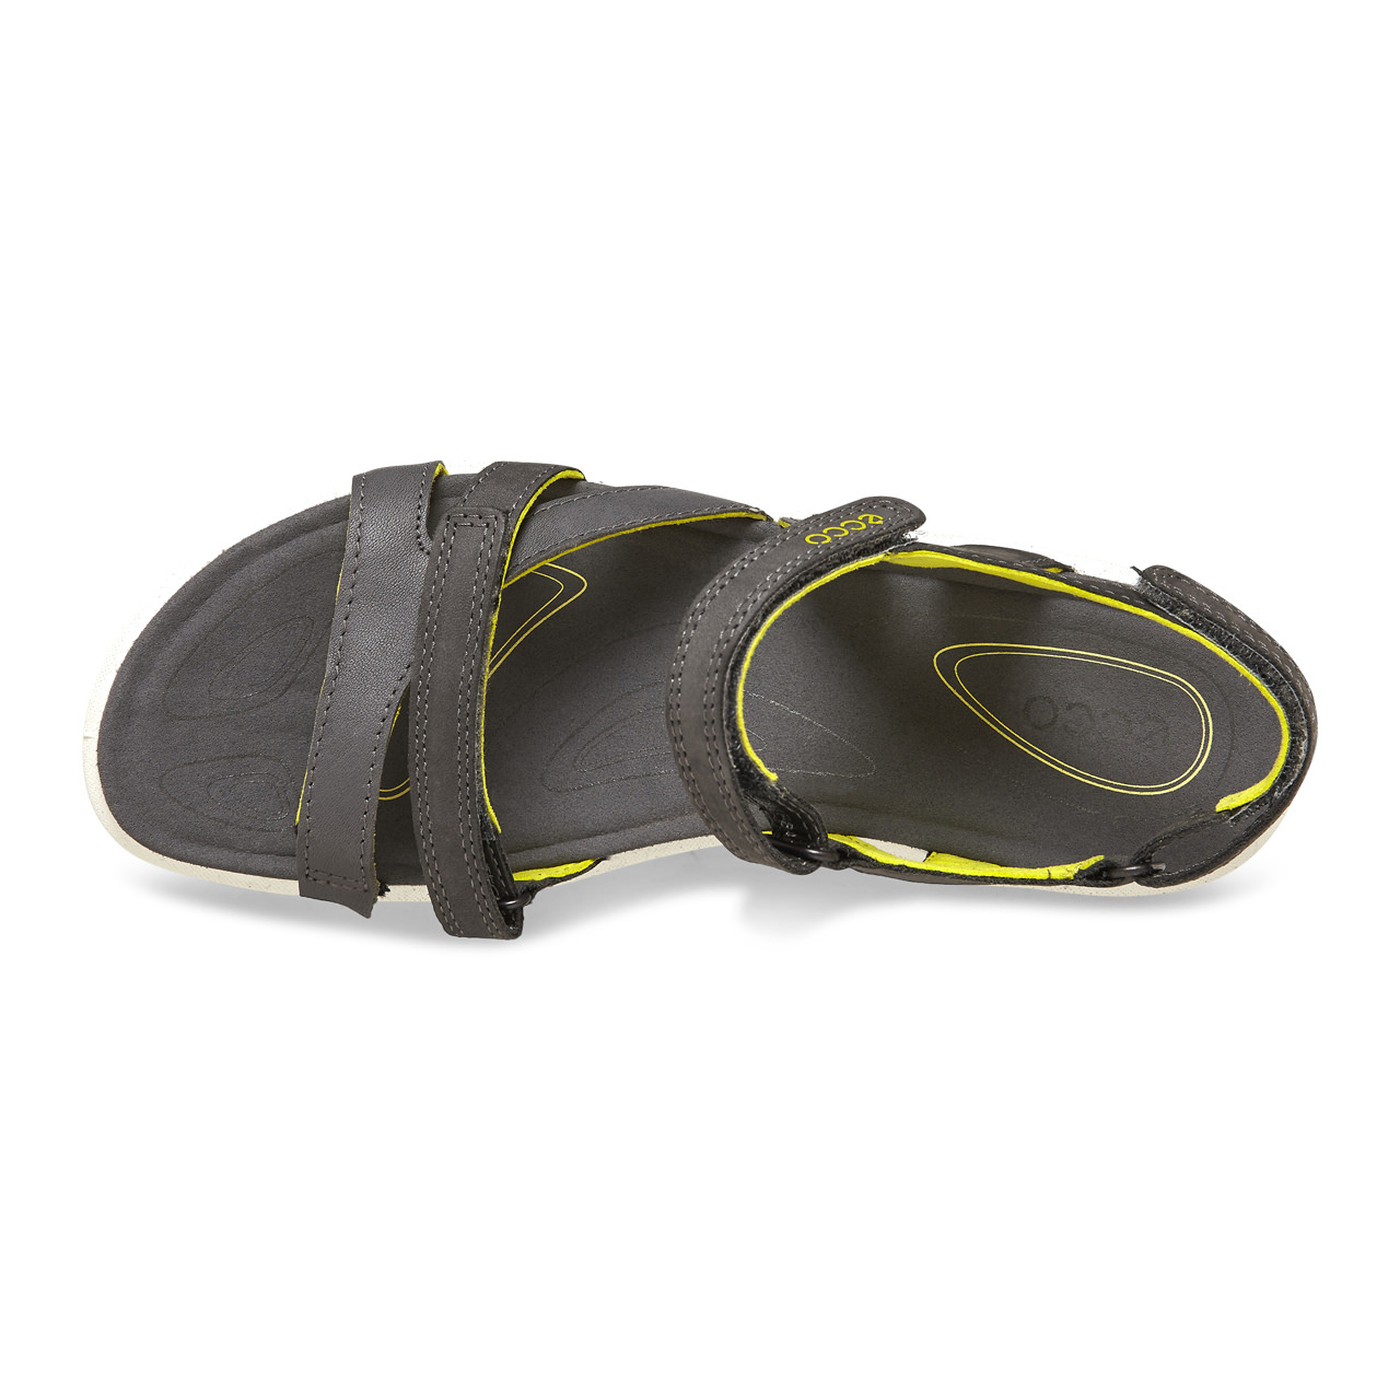 ECCO CRUISE Ladies Sports Sandal